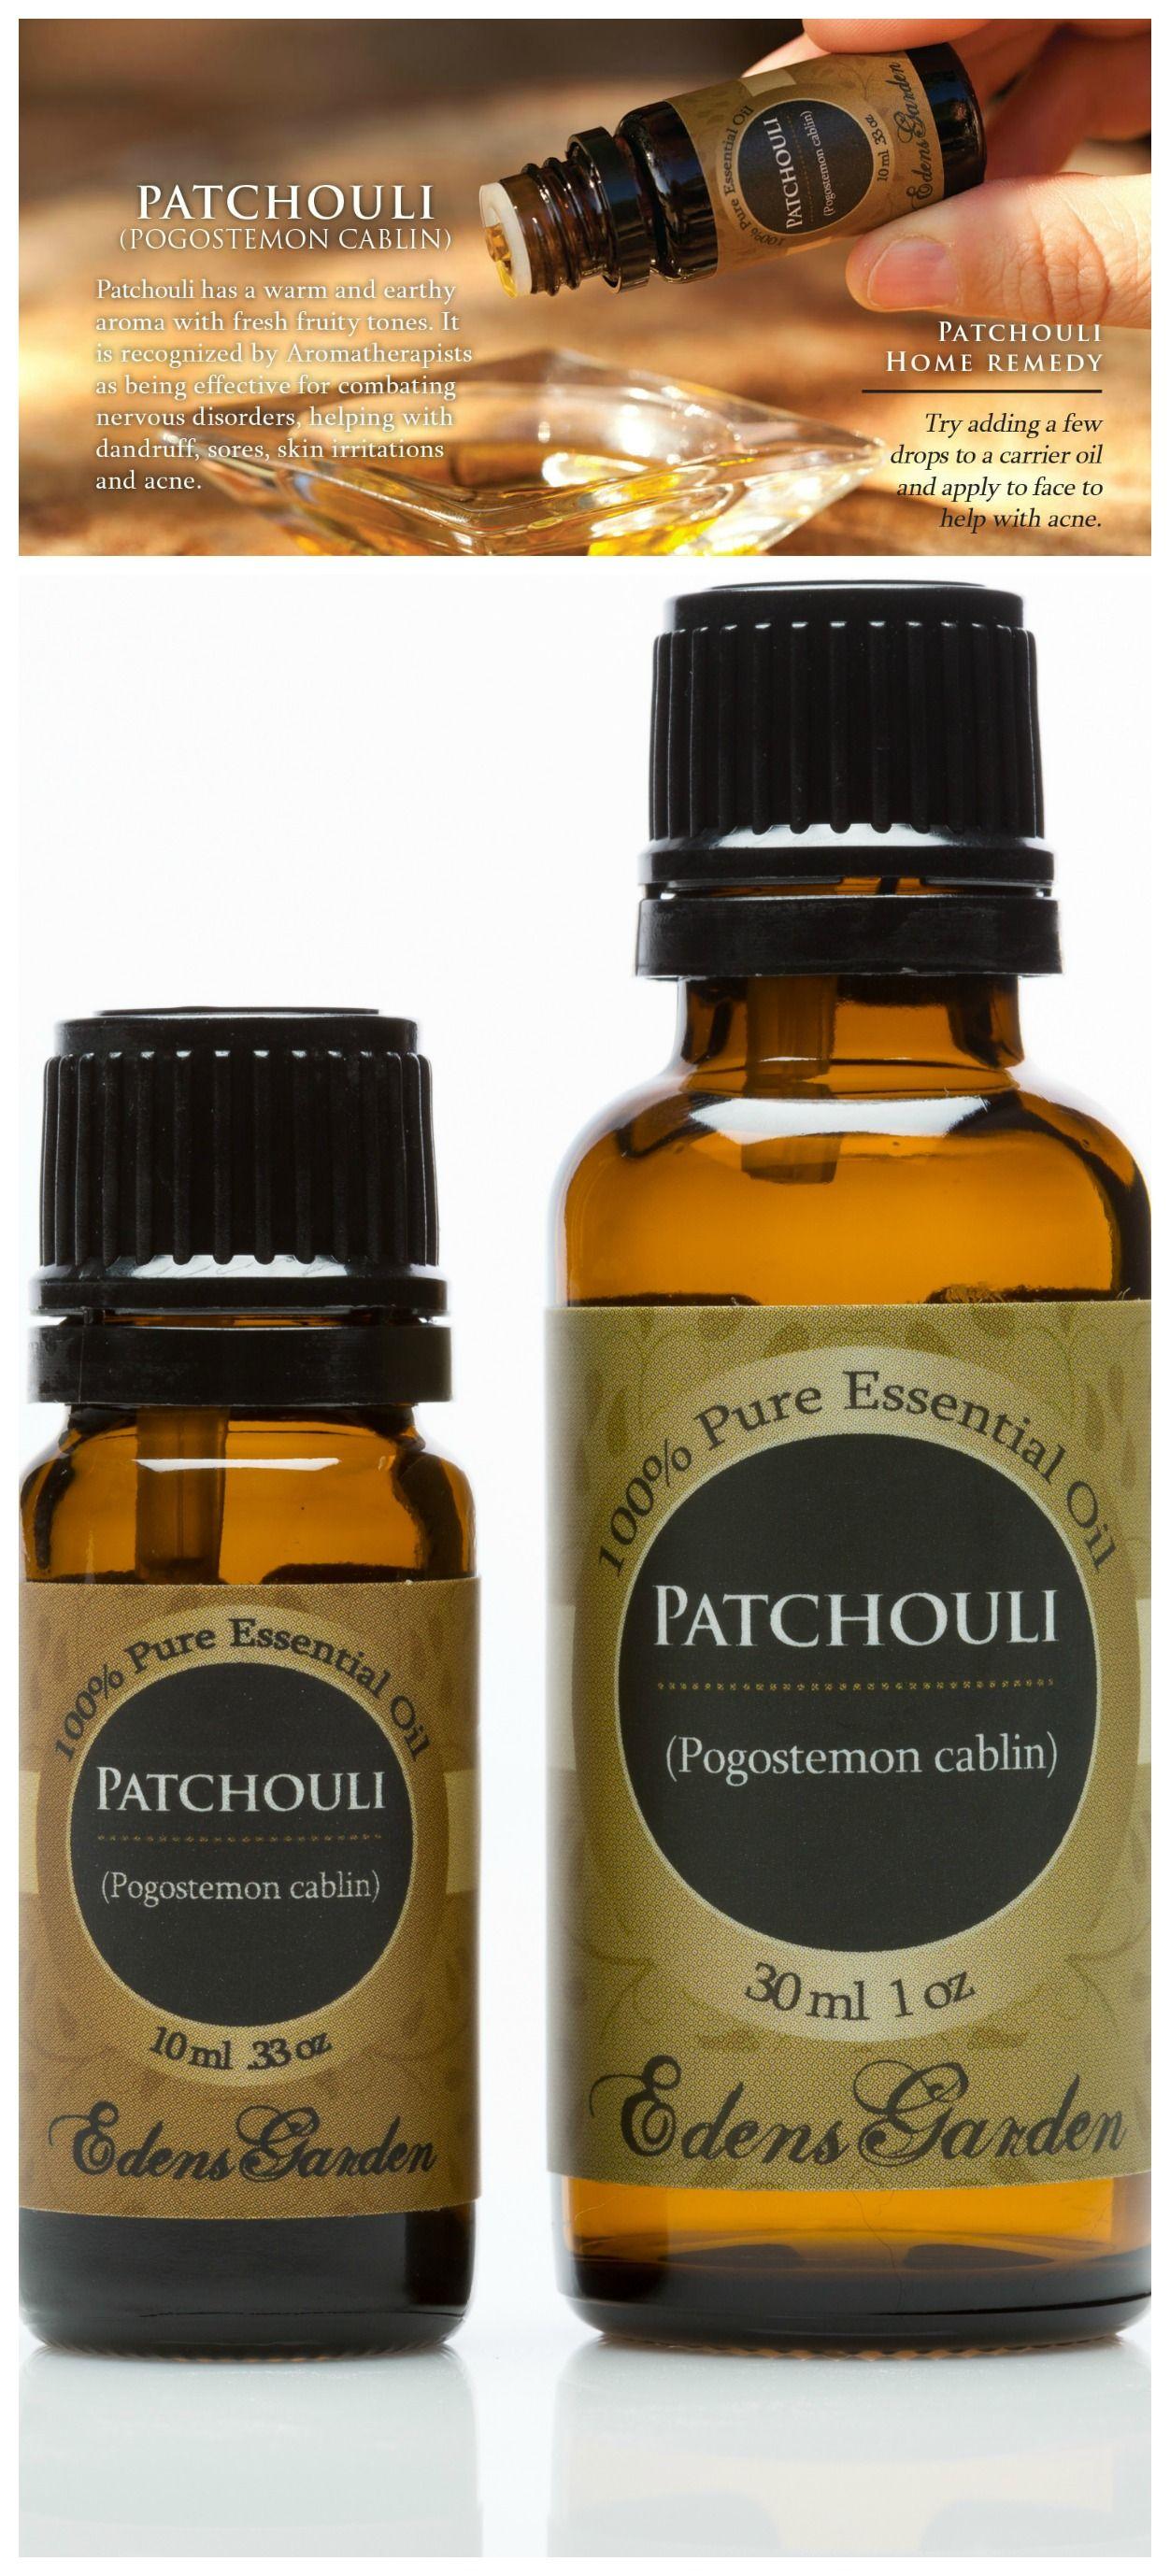 Patchouli Essential Oil has amazing skin care properties